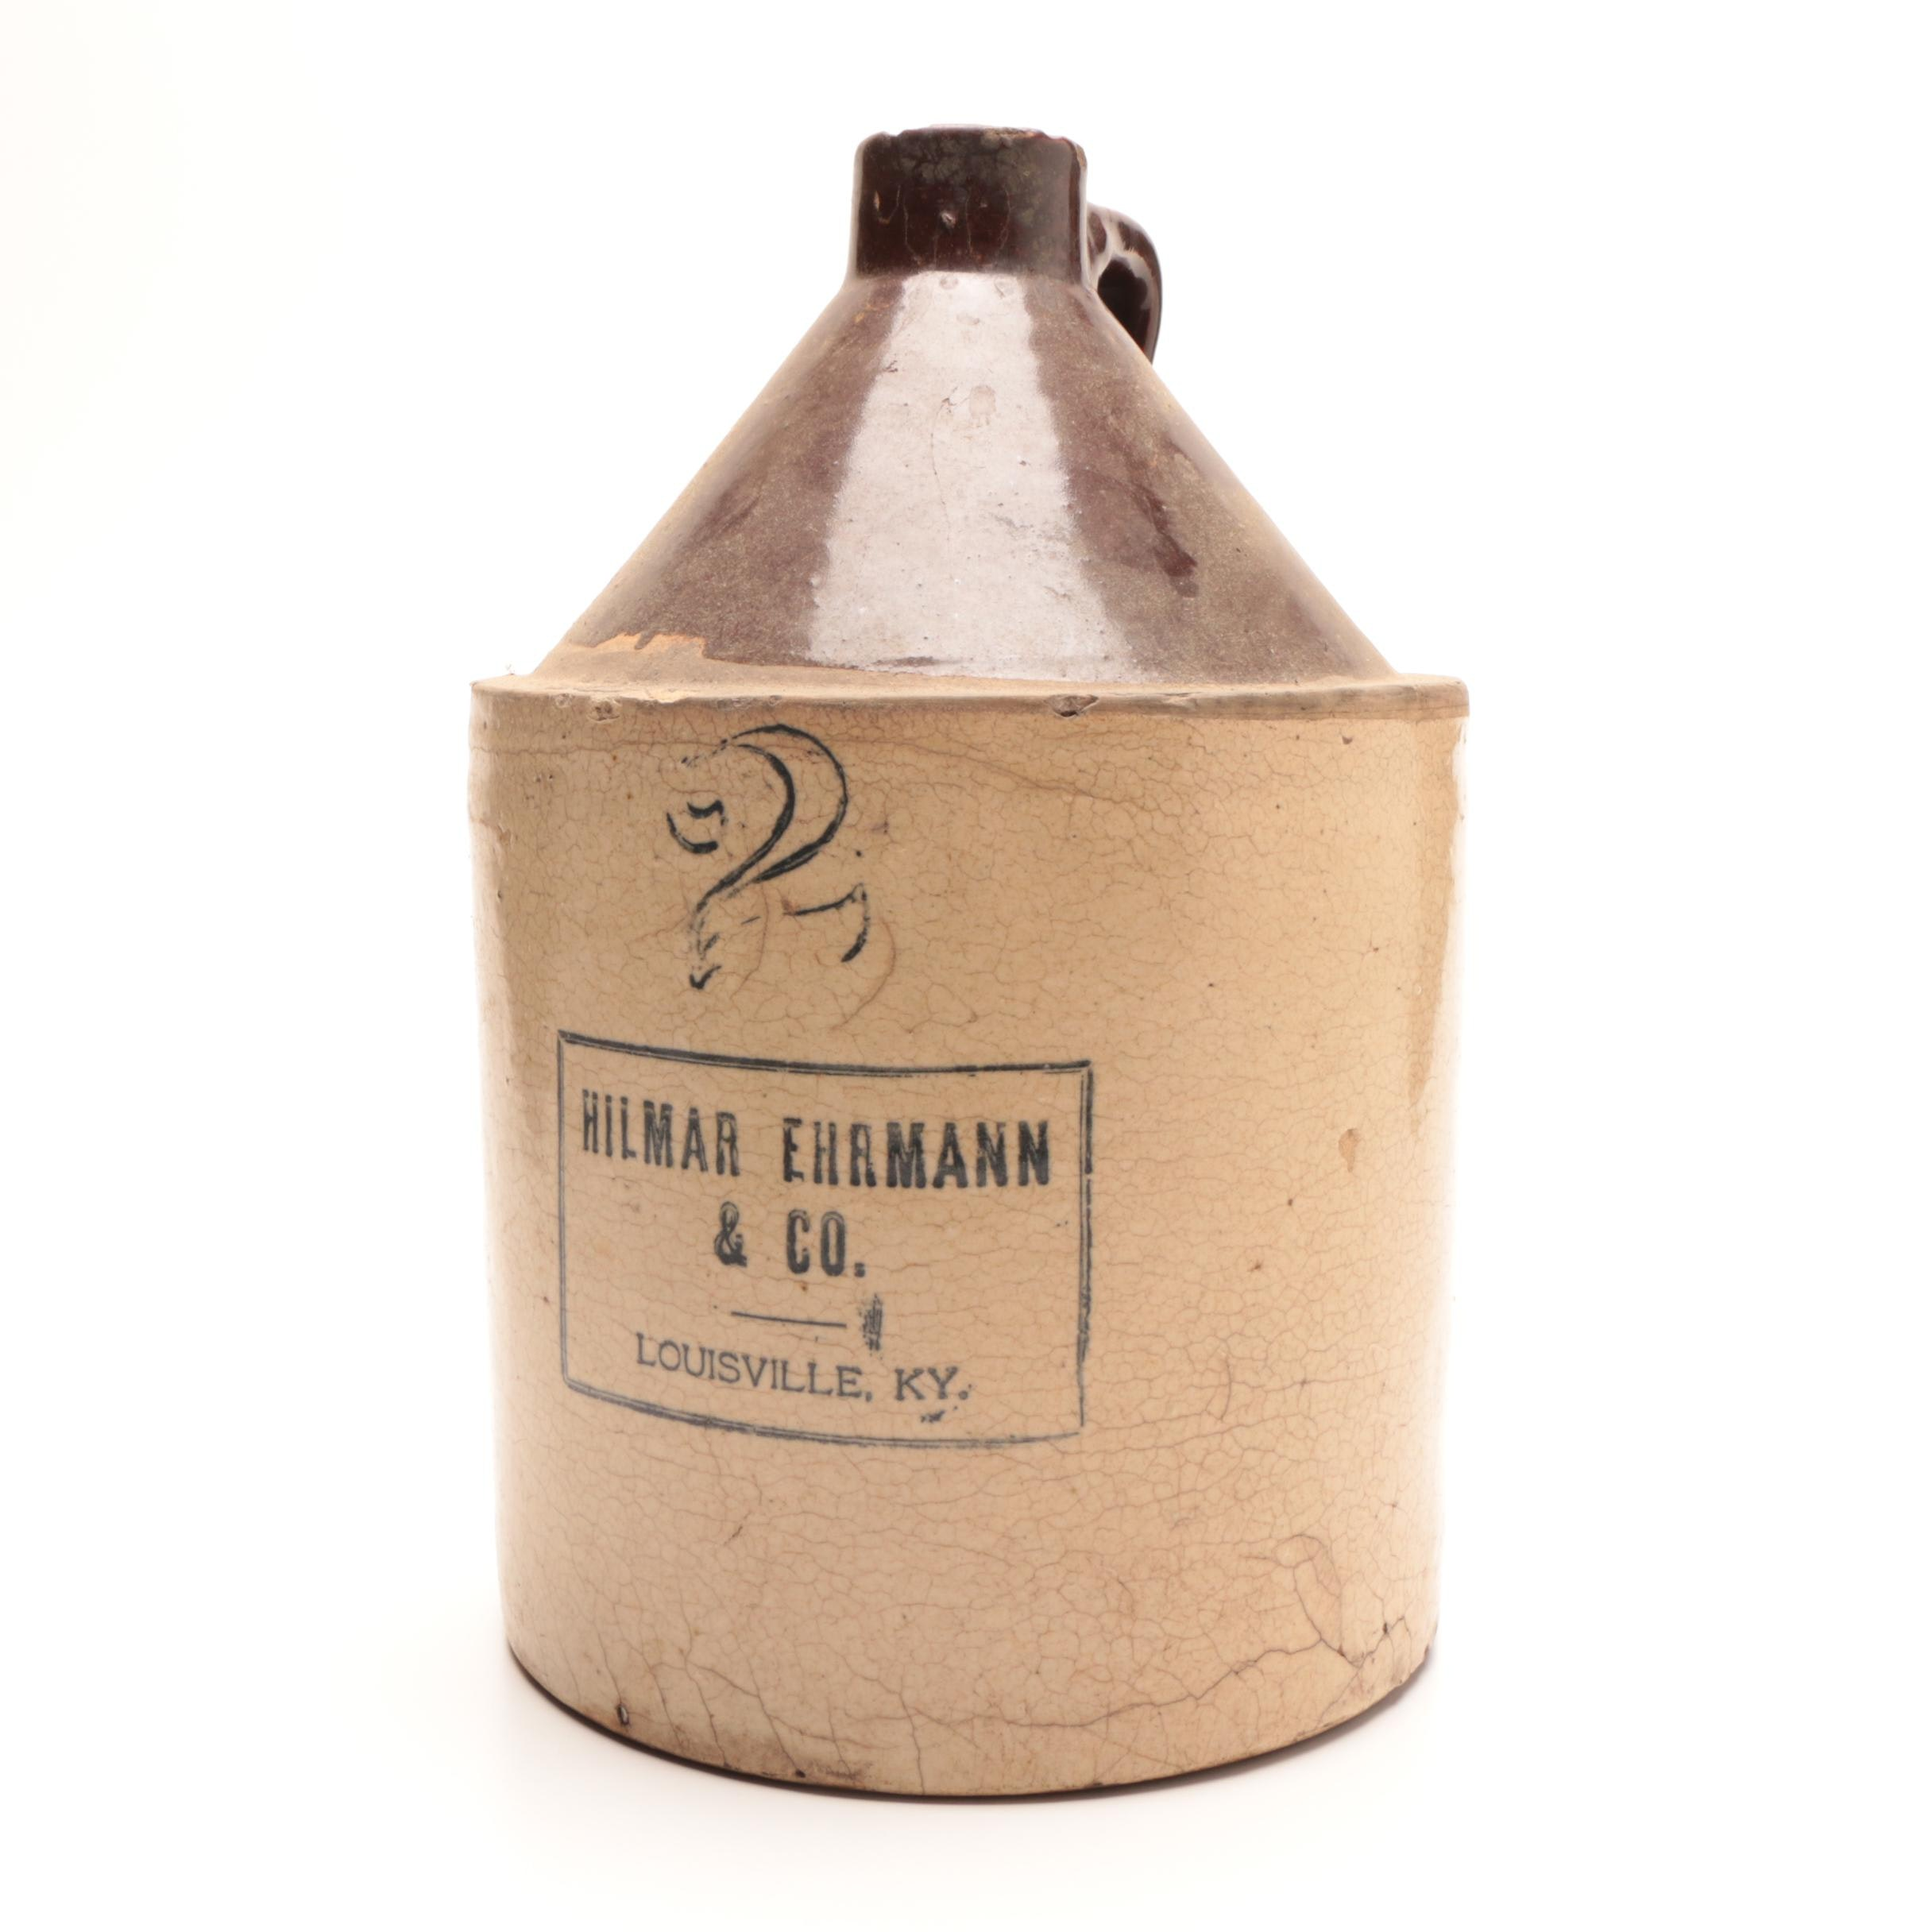 Antique Hilmar Ehrmann & Co. Louisville, Kentucky Stoneware Jug